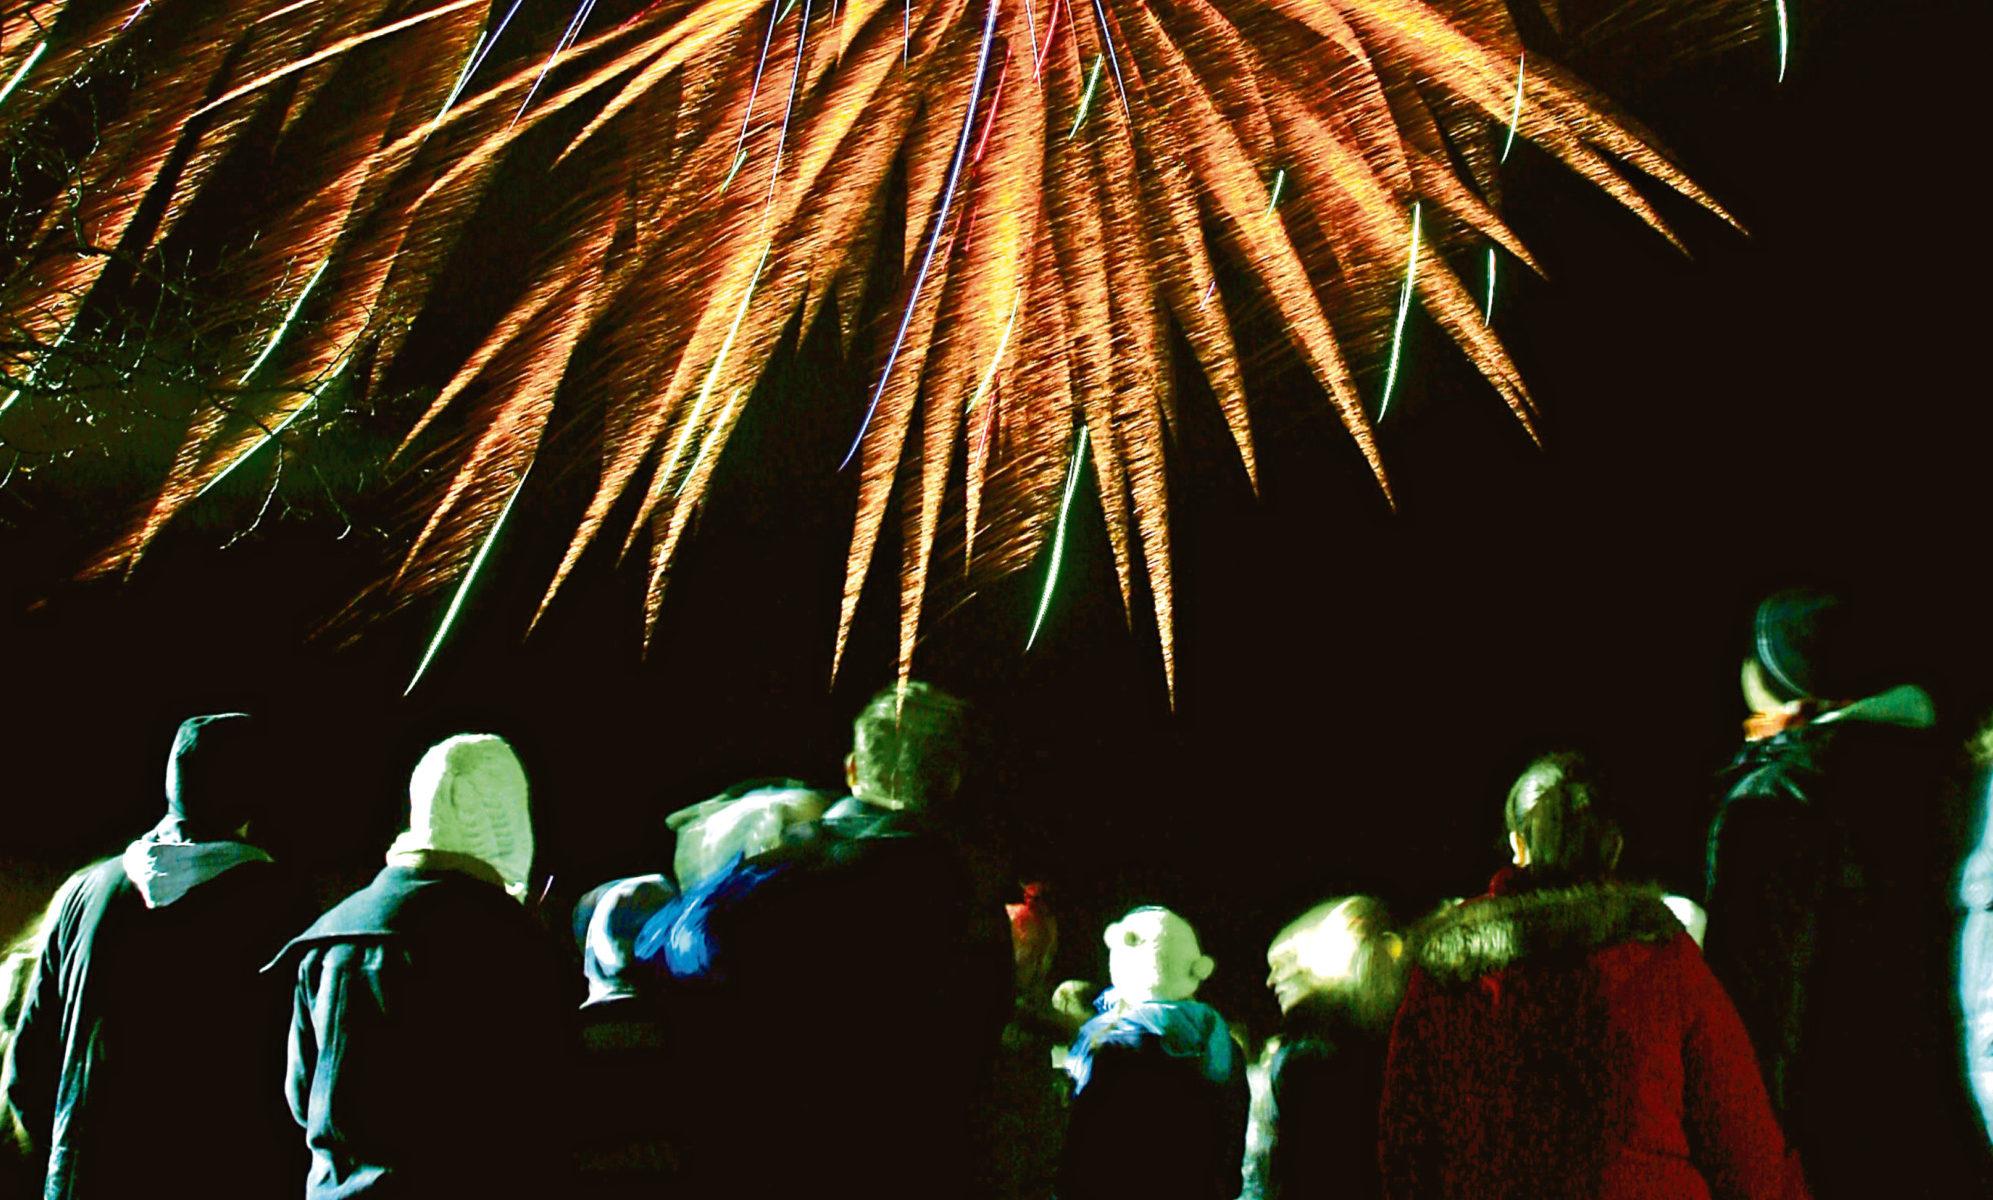 Firework display at Baxter Park